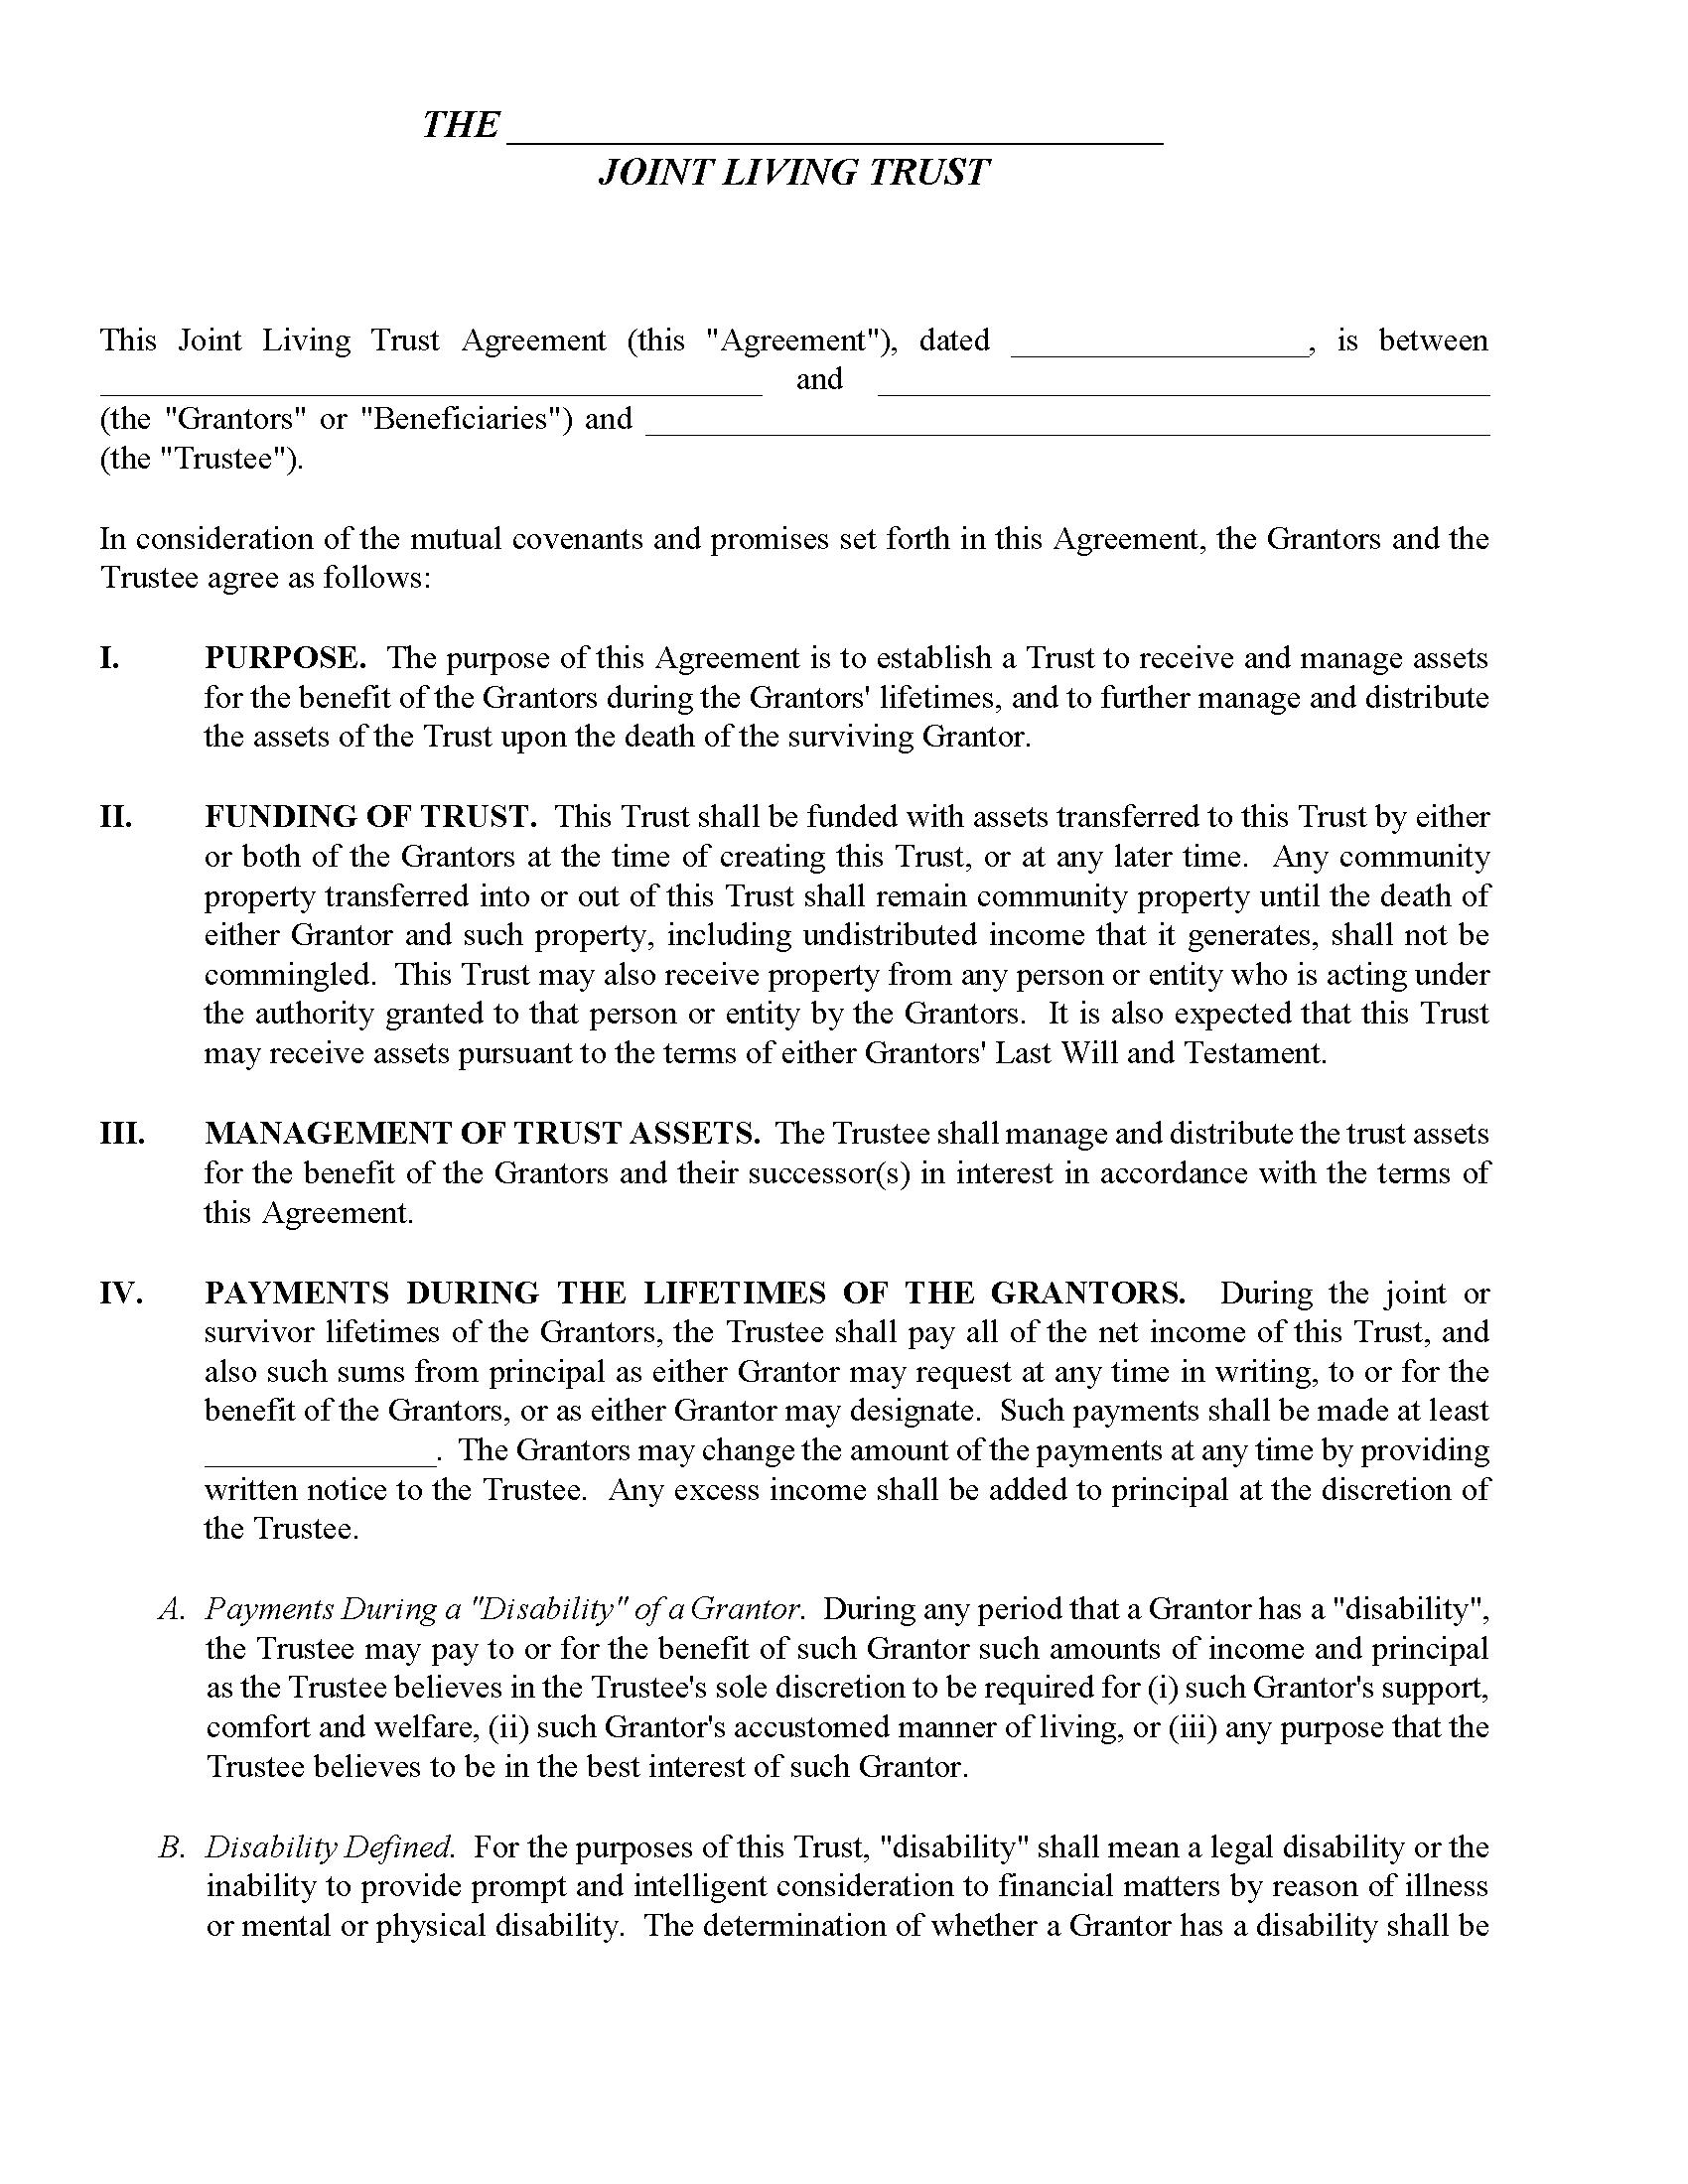 Idaho Joint Living Trust Form